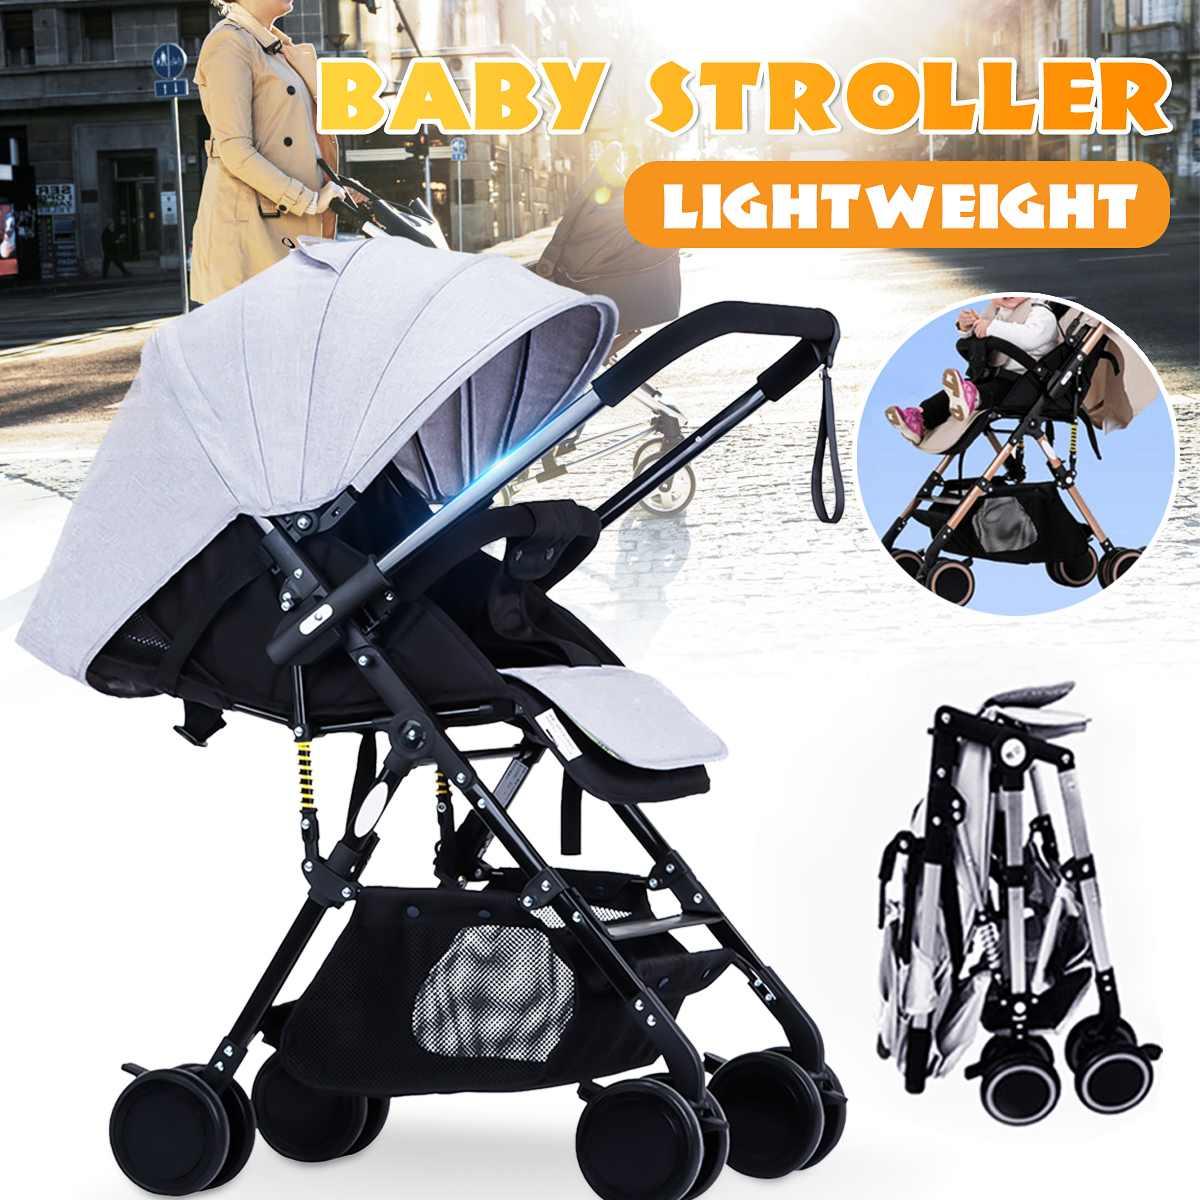 Cochecito de bebé avión ligero portátil viaje cochecito para niños 2 en 1 alto paisaje cochecito plegable cochecito para recién nacido